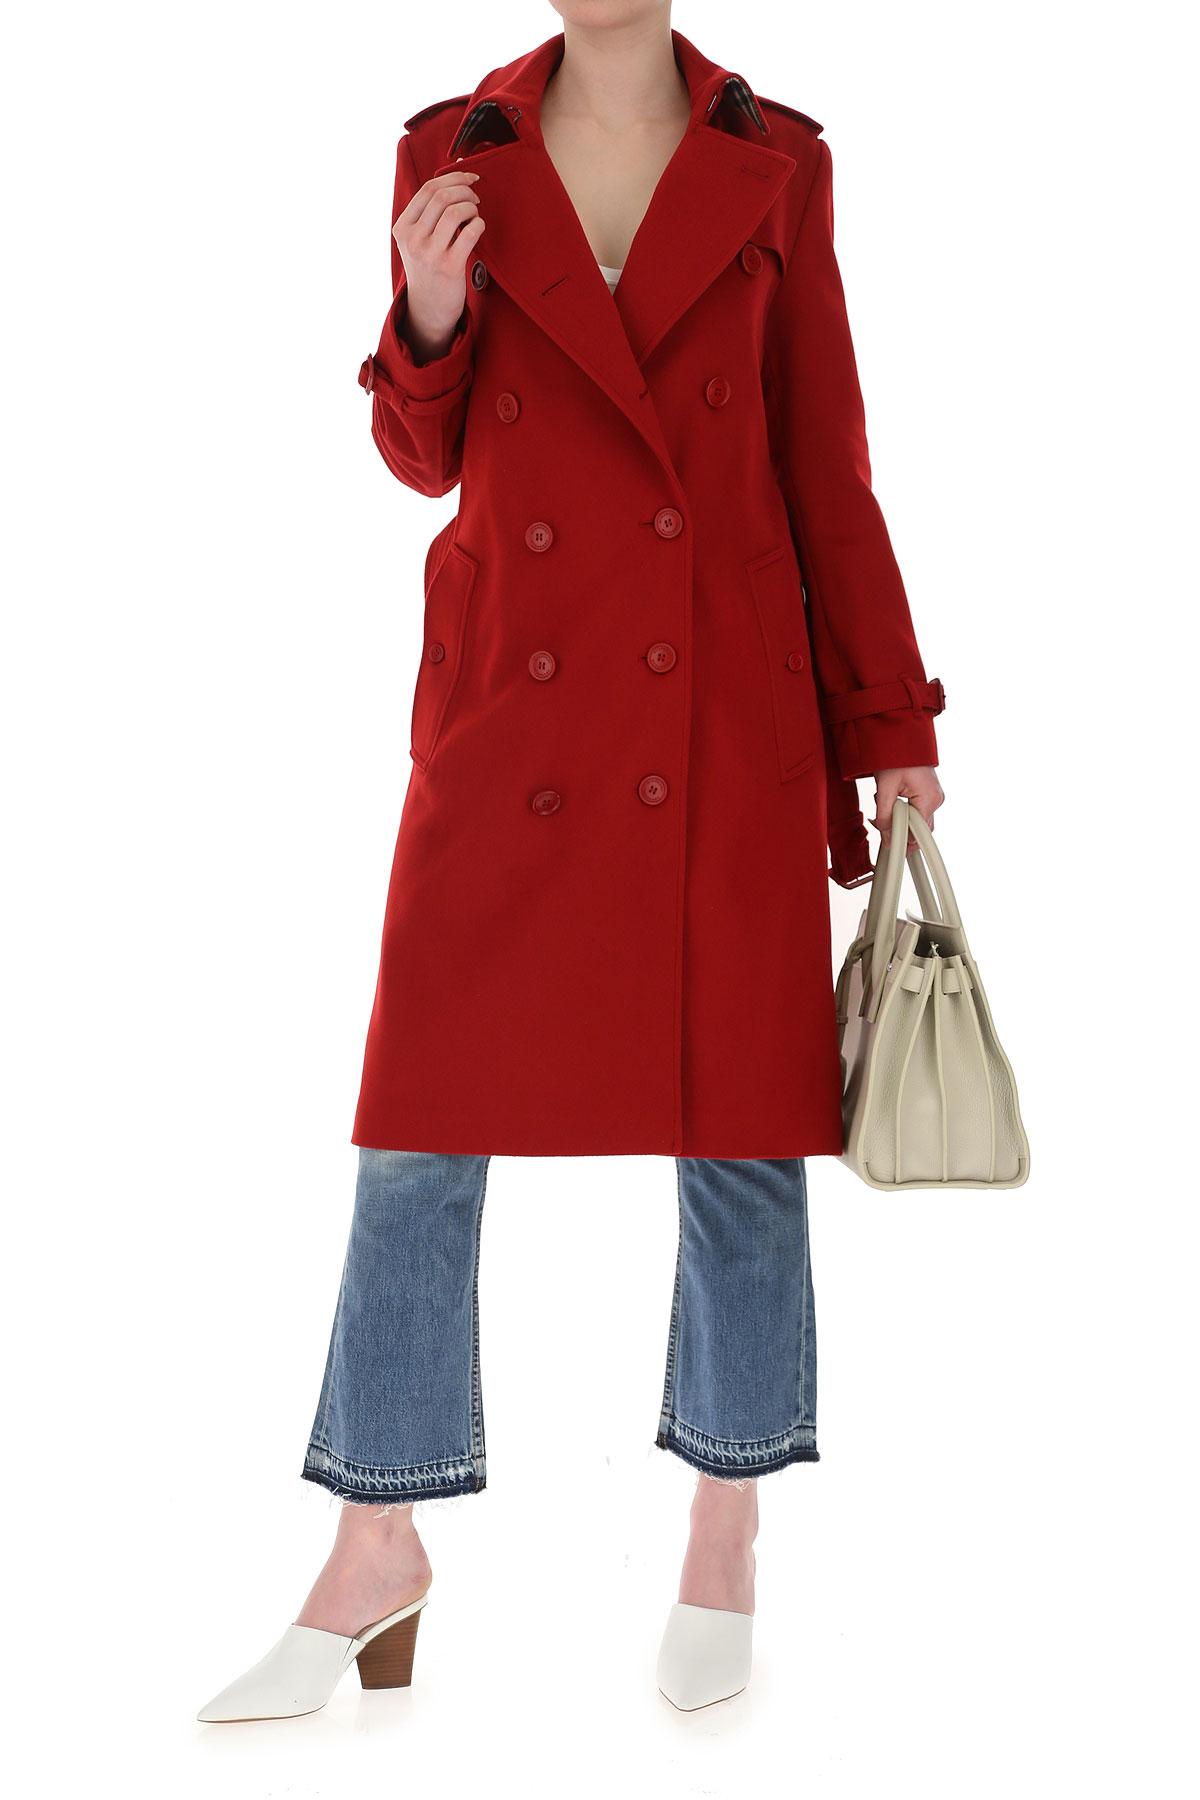 Primavera Para Burberry Mujer 2019 Rojo nbsp; Ropa verano Aqgqfw